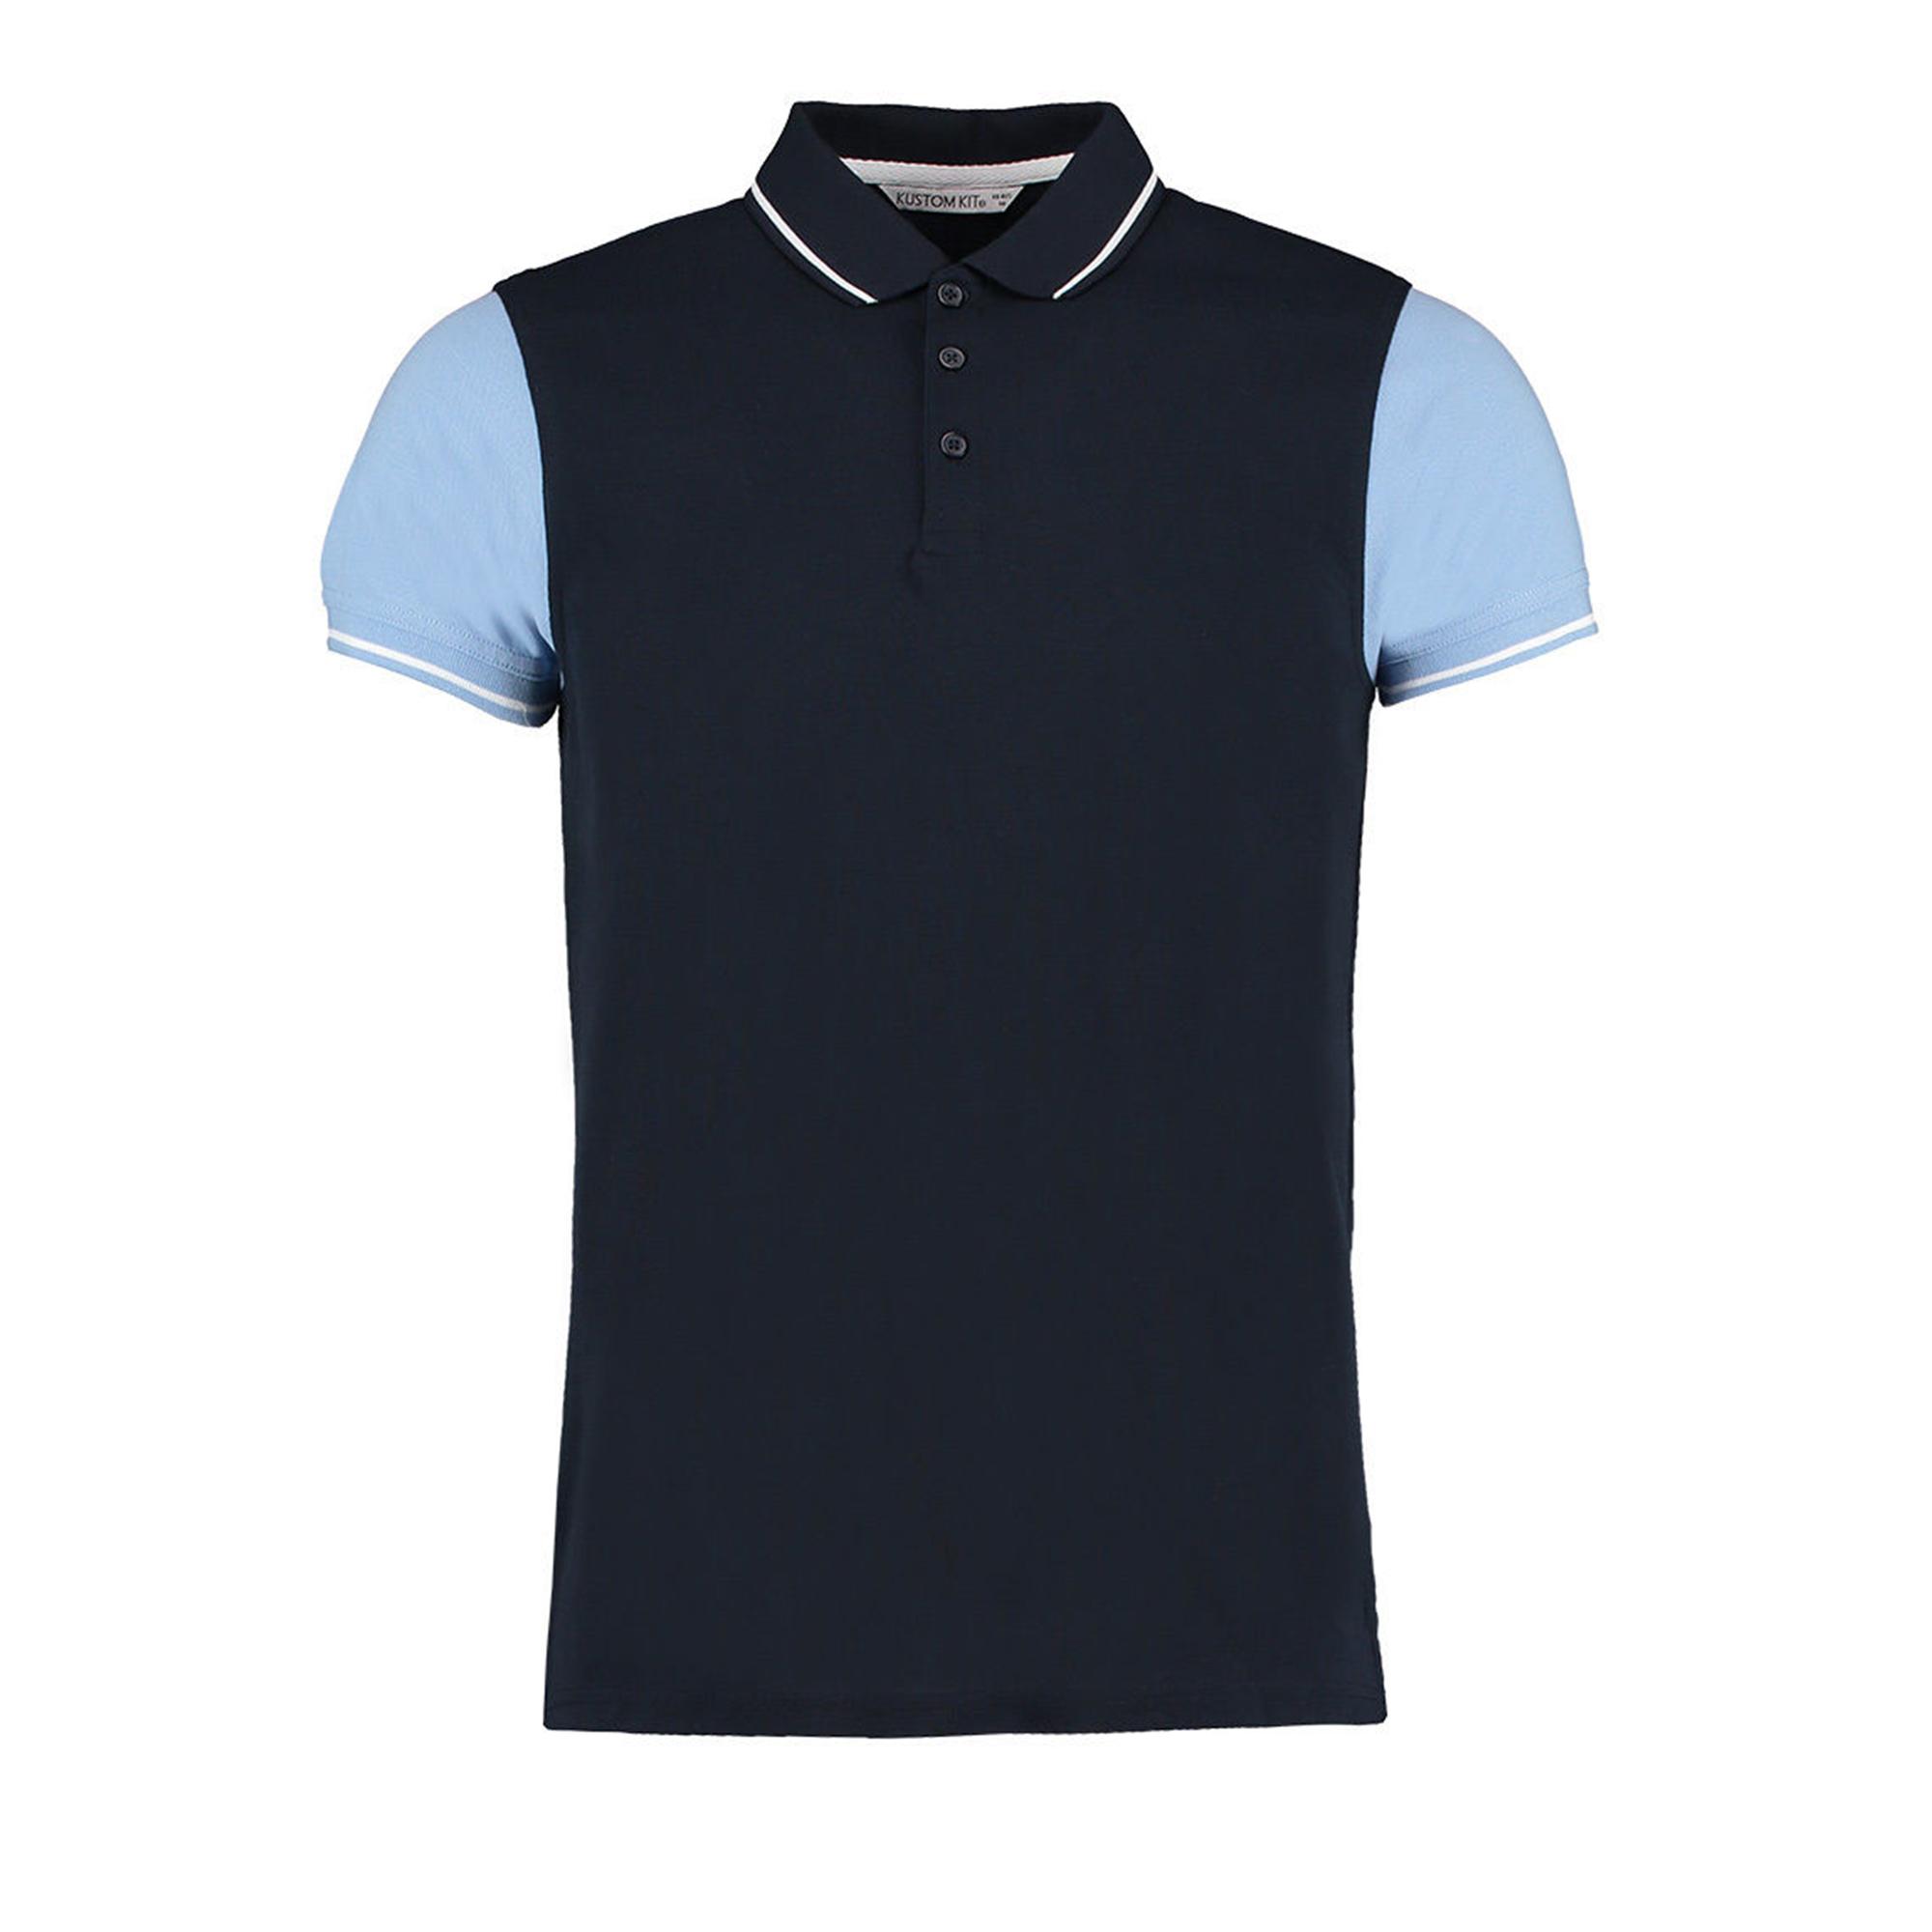 Kustom-Kit-Mens-Two-Tone-Contrast-Tipped-Polo-Shirt-BC3728